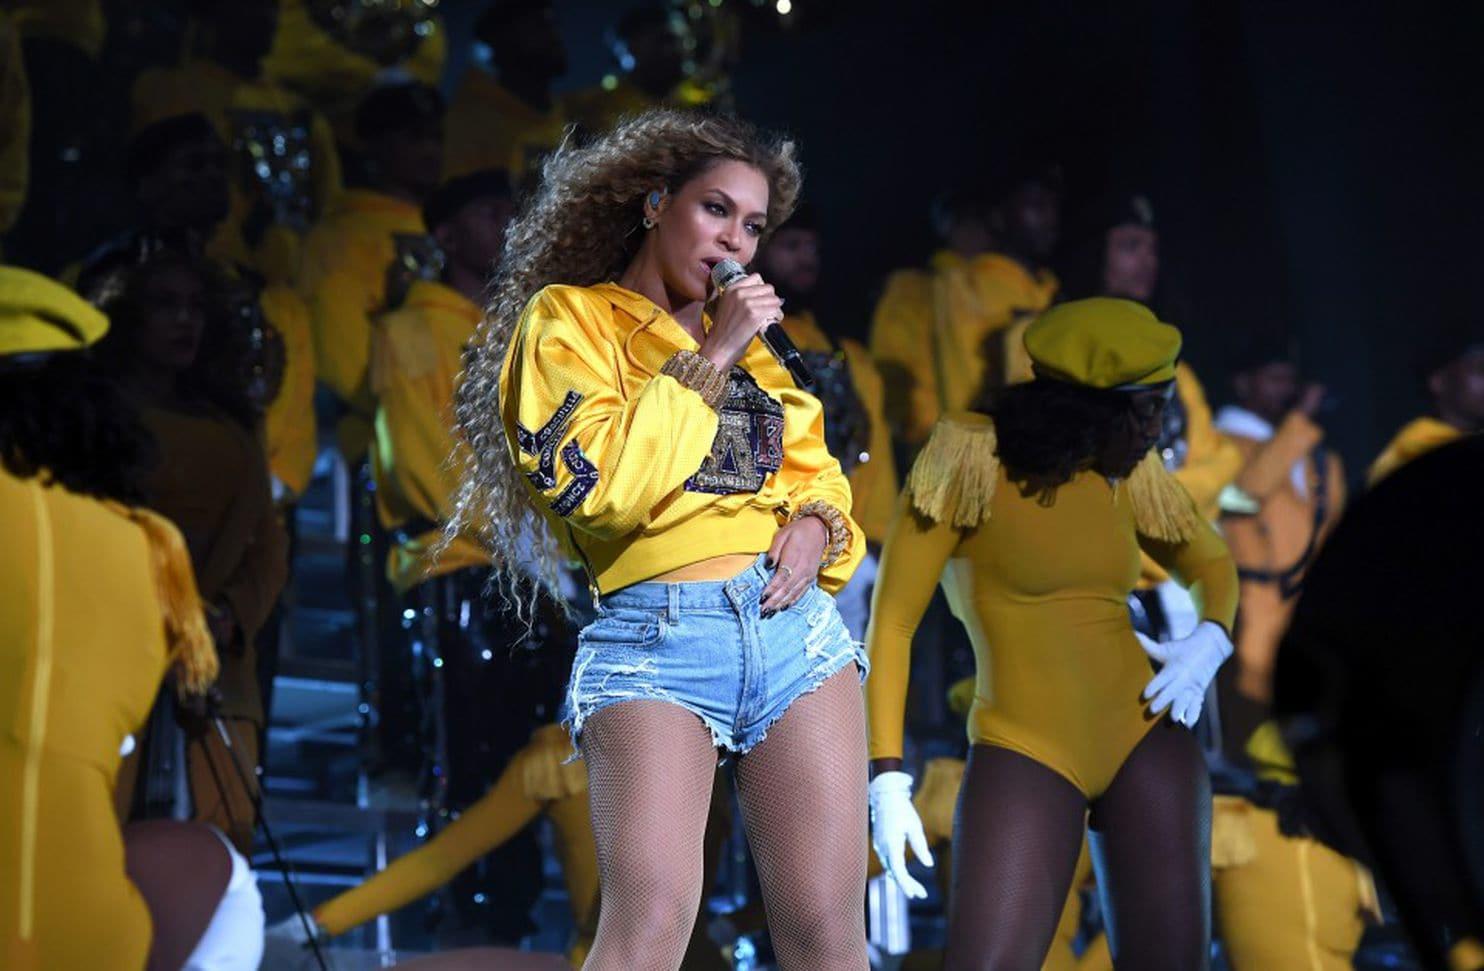 Beyoncé performing at Coachella, photo via  Getty Images